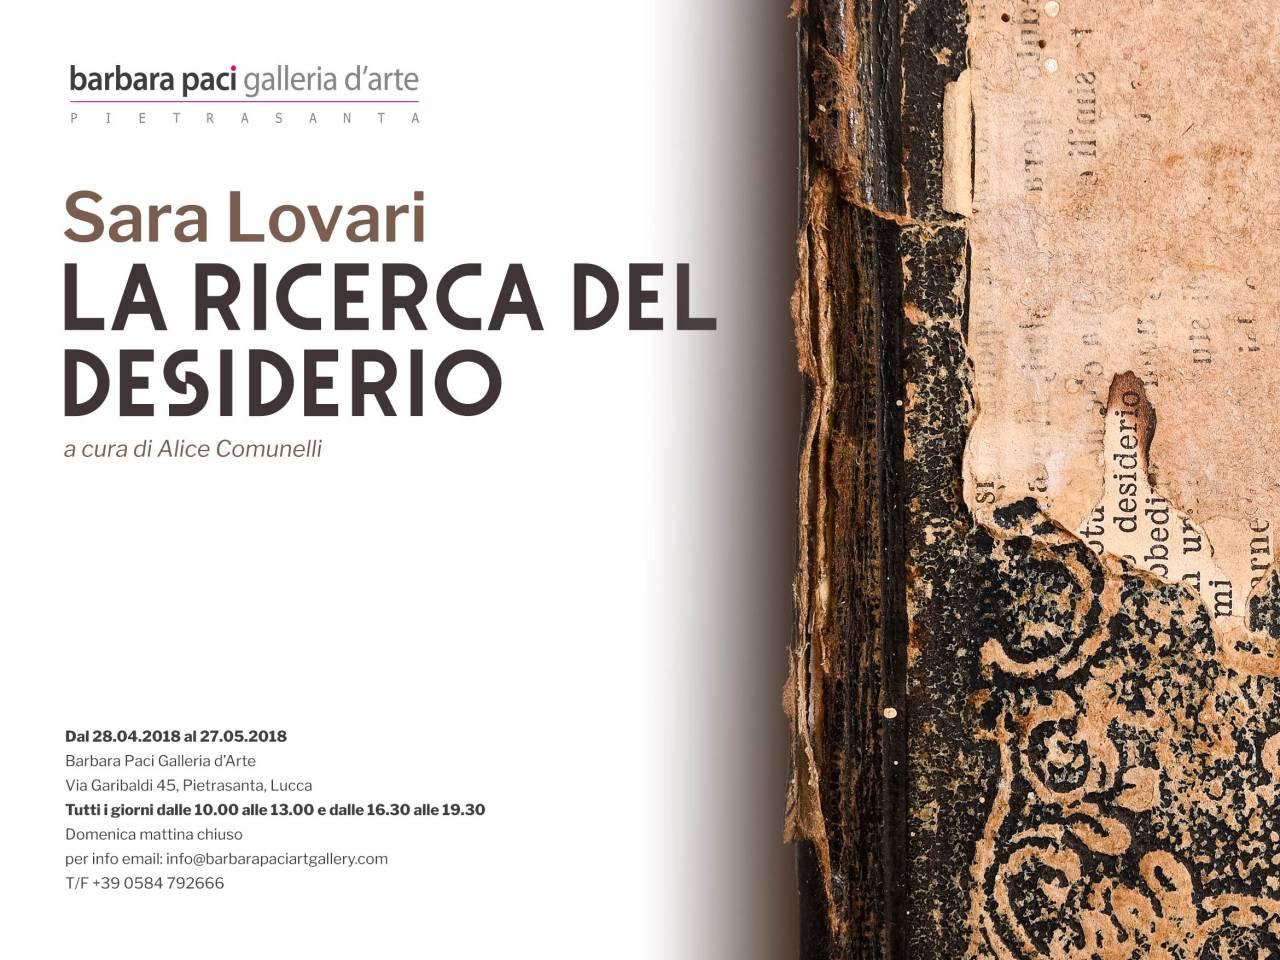 Sara Lovari - Barbara Paci Galleria d